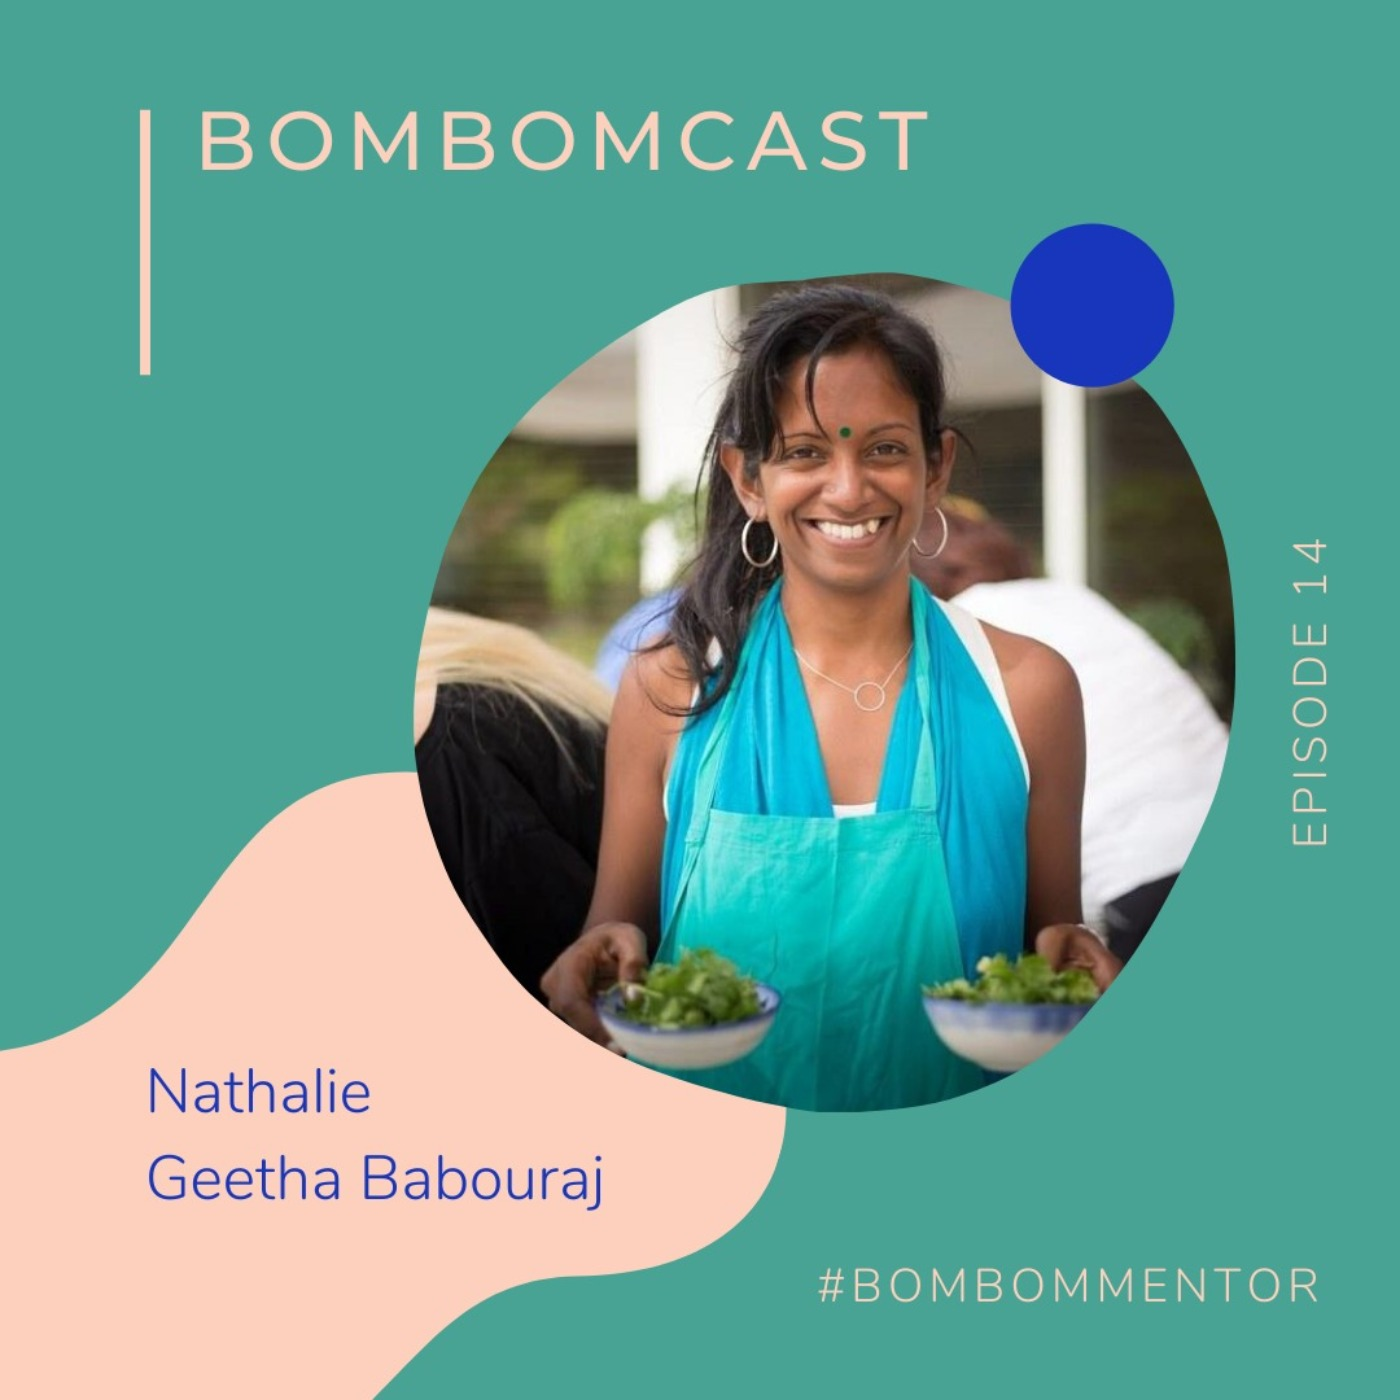 #14 - L'alimentation et l'ayurvéda, par Nathalie Geetha Babouraj